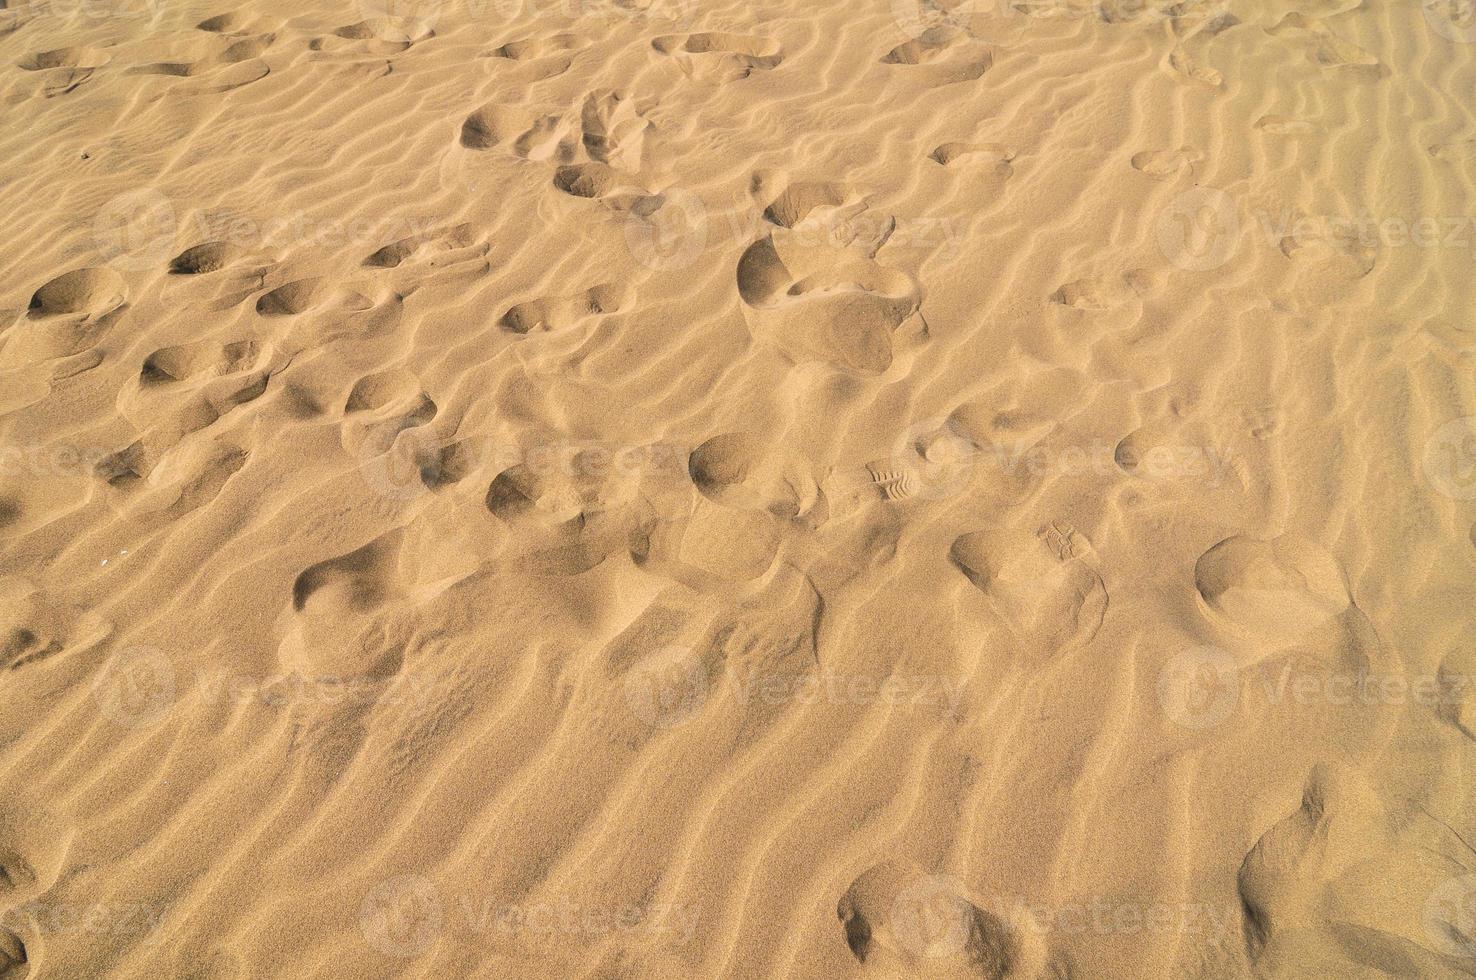 deserto di dune di sabbia foto